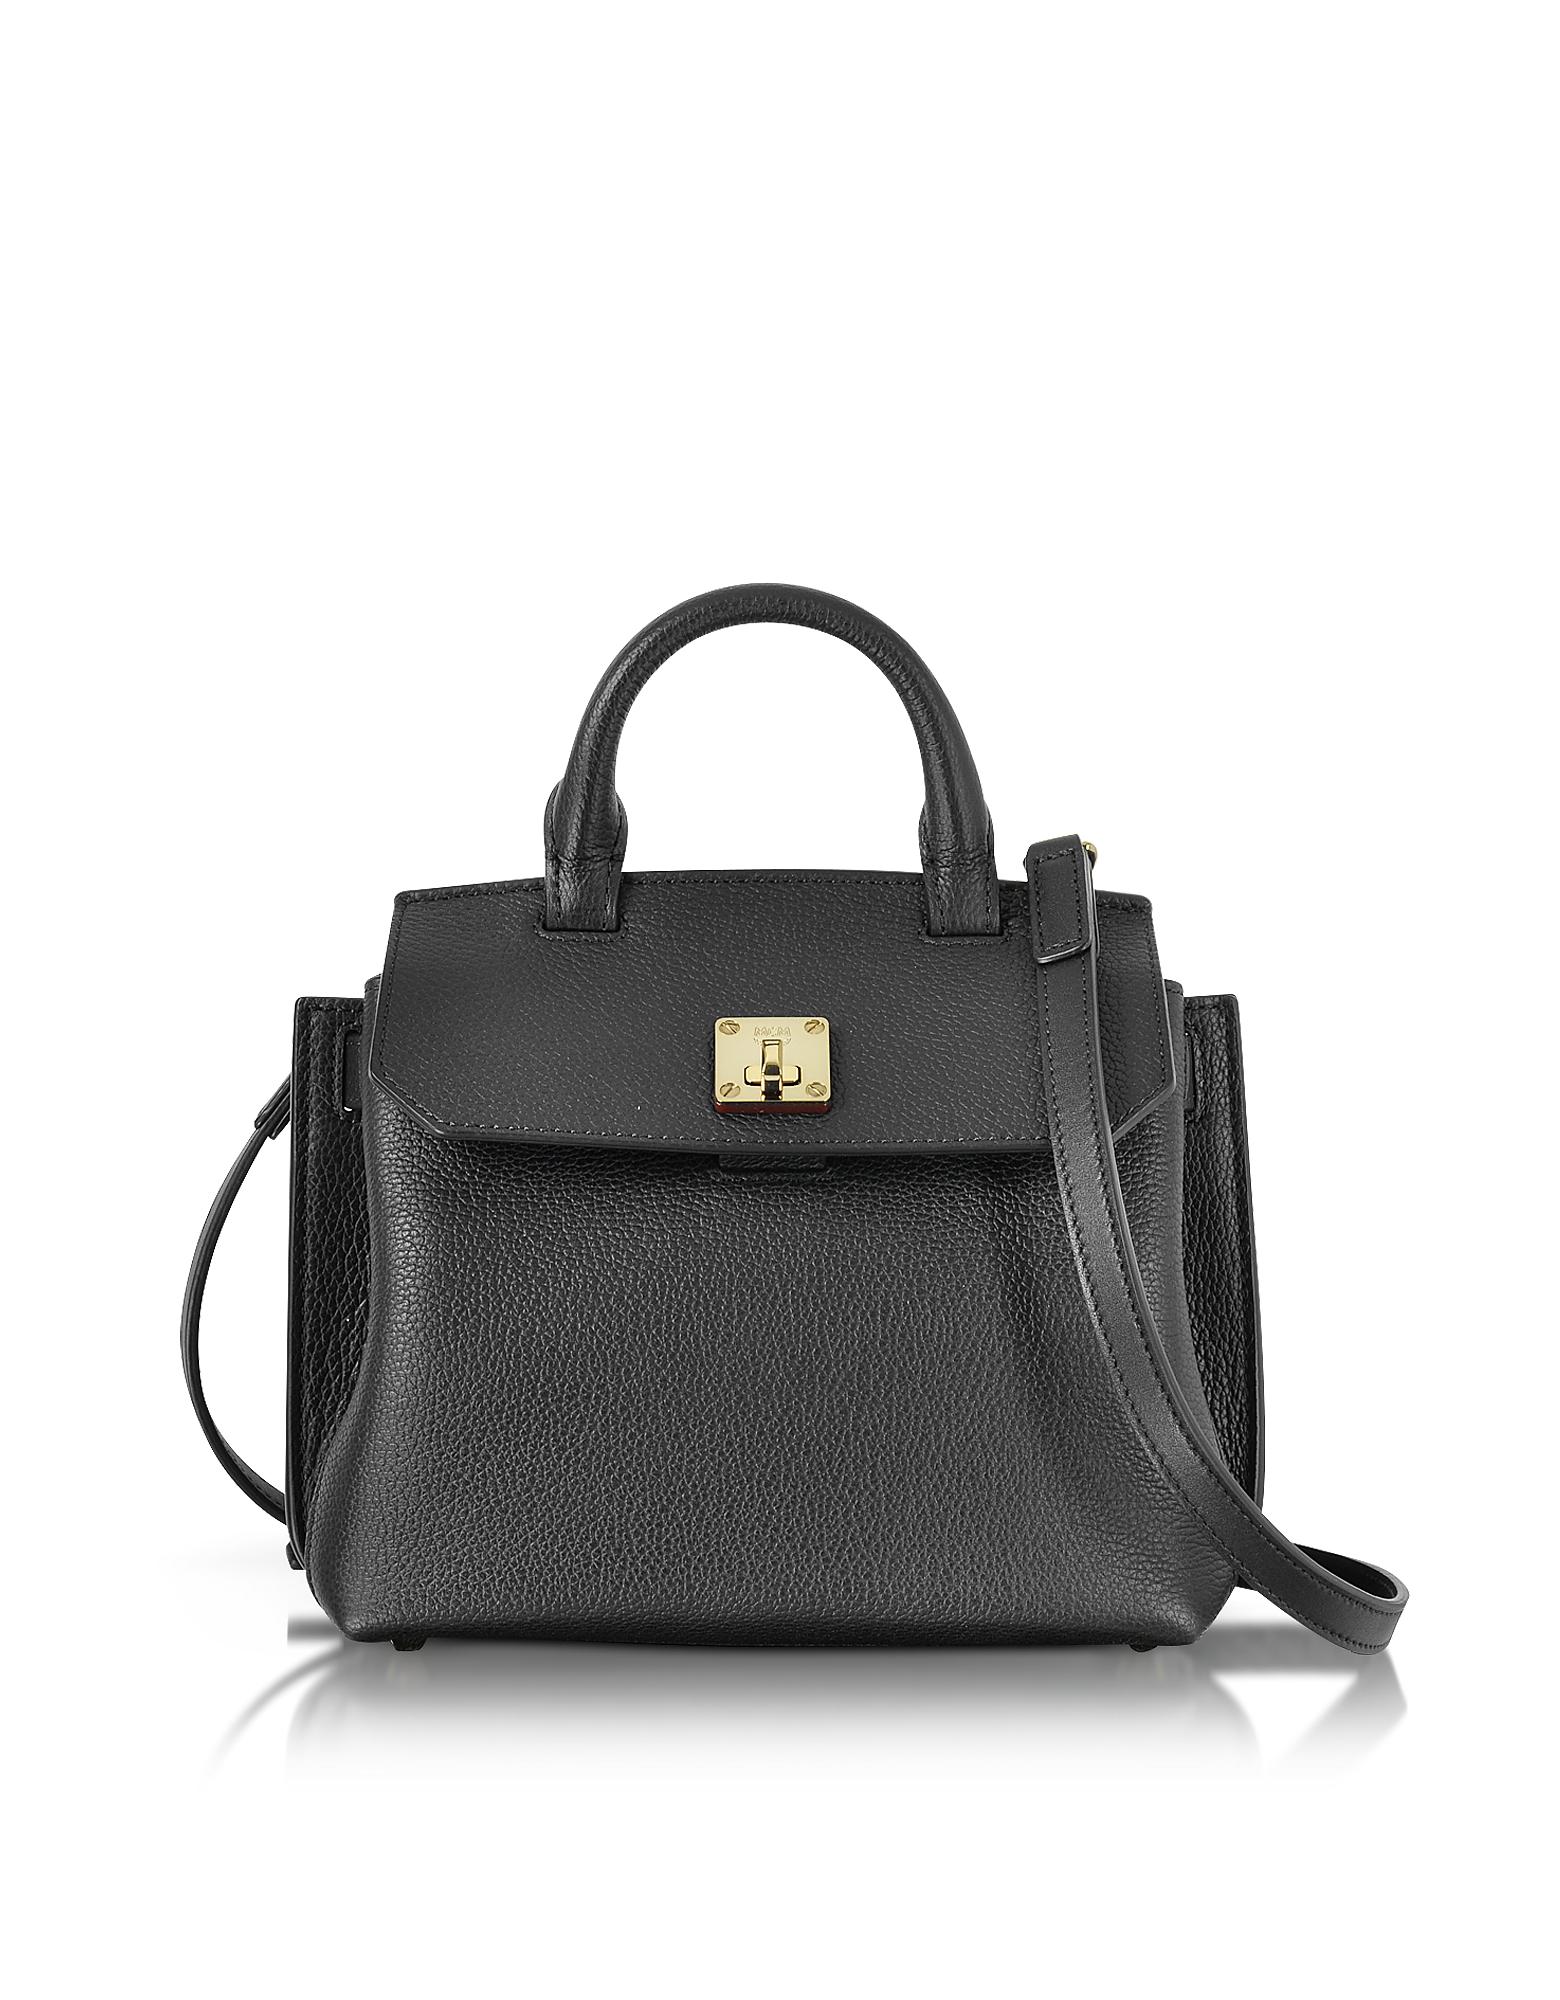 MCM Handbags, Black Park Avenue Leather Milla Small Crossbody